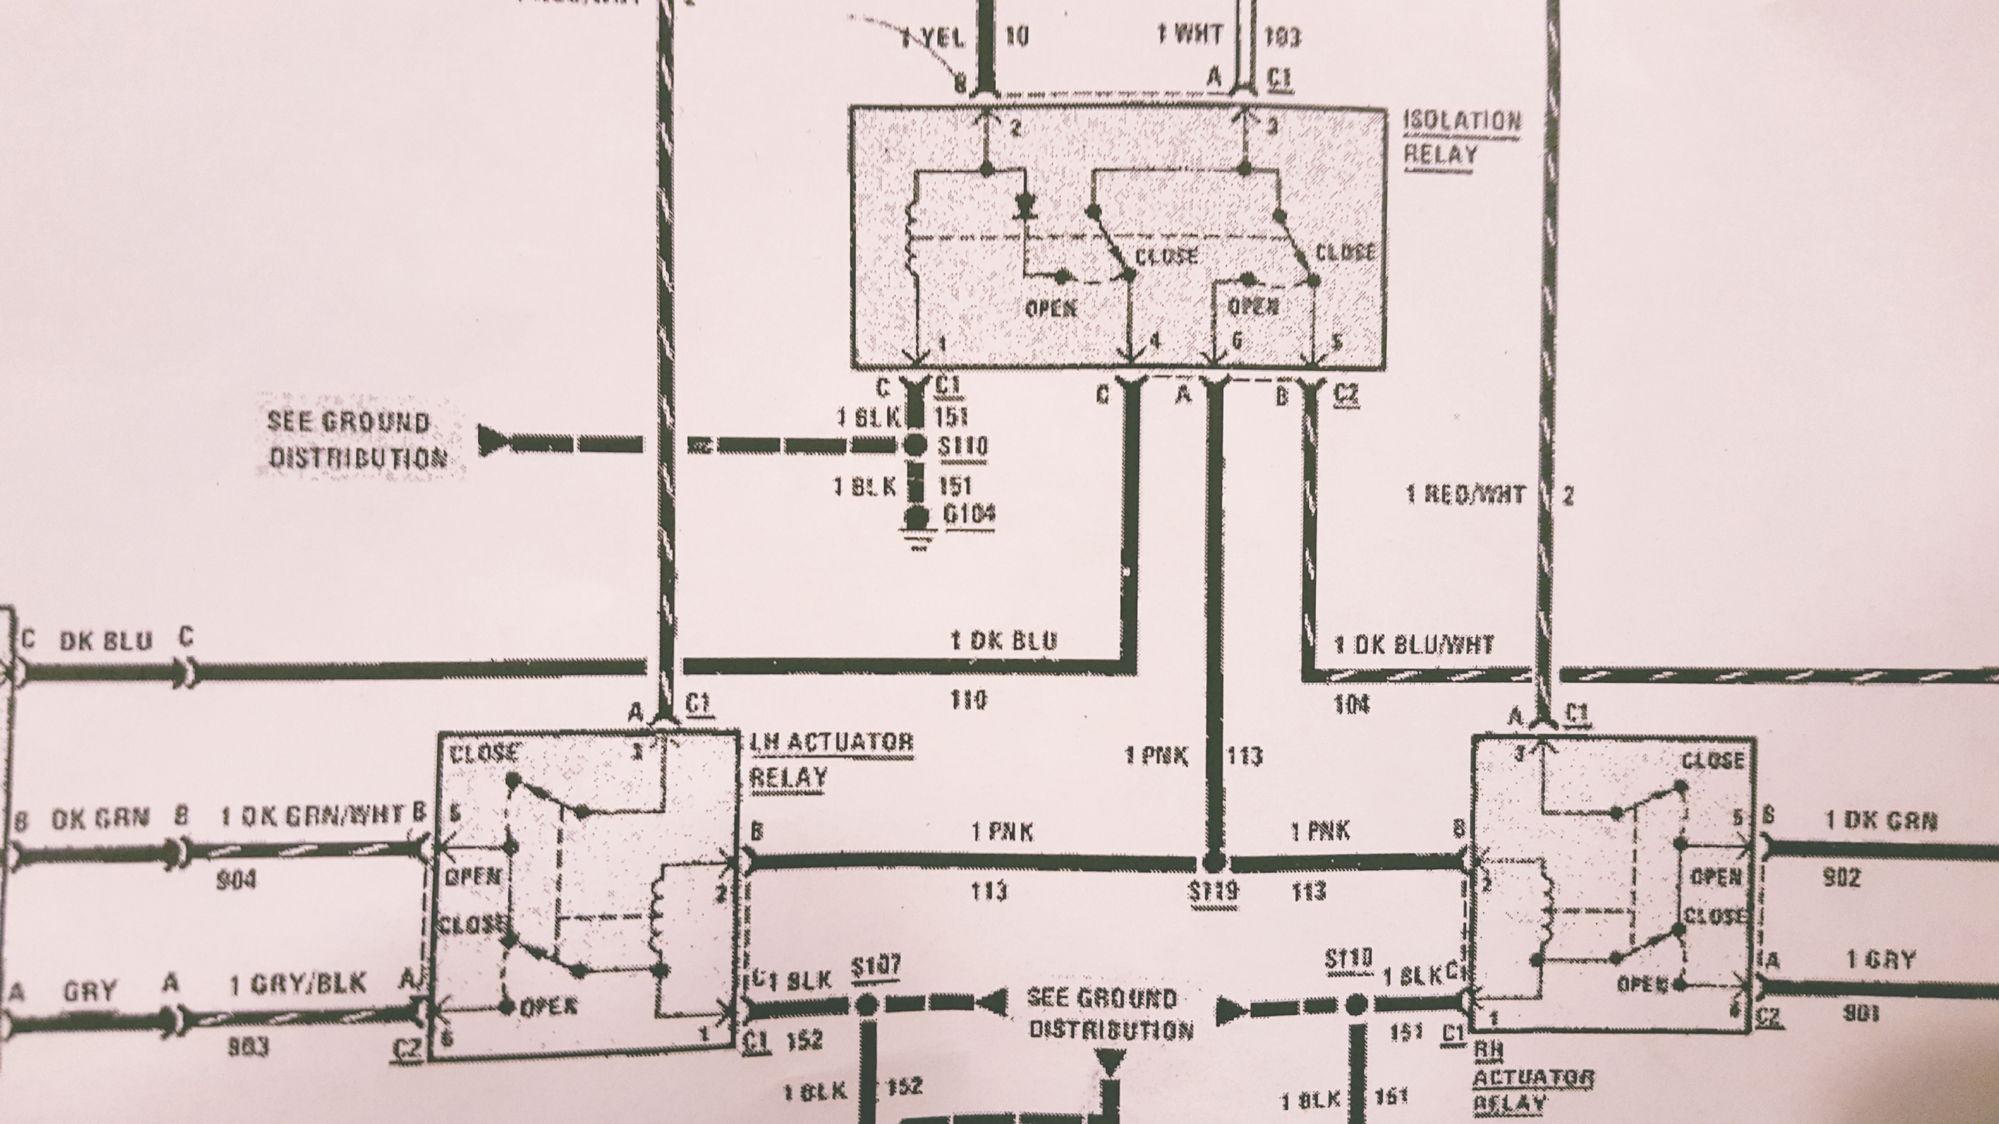 1984 trans am headlight relay information third generation f body rh thirdgen org